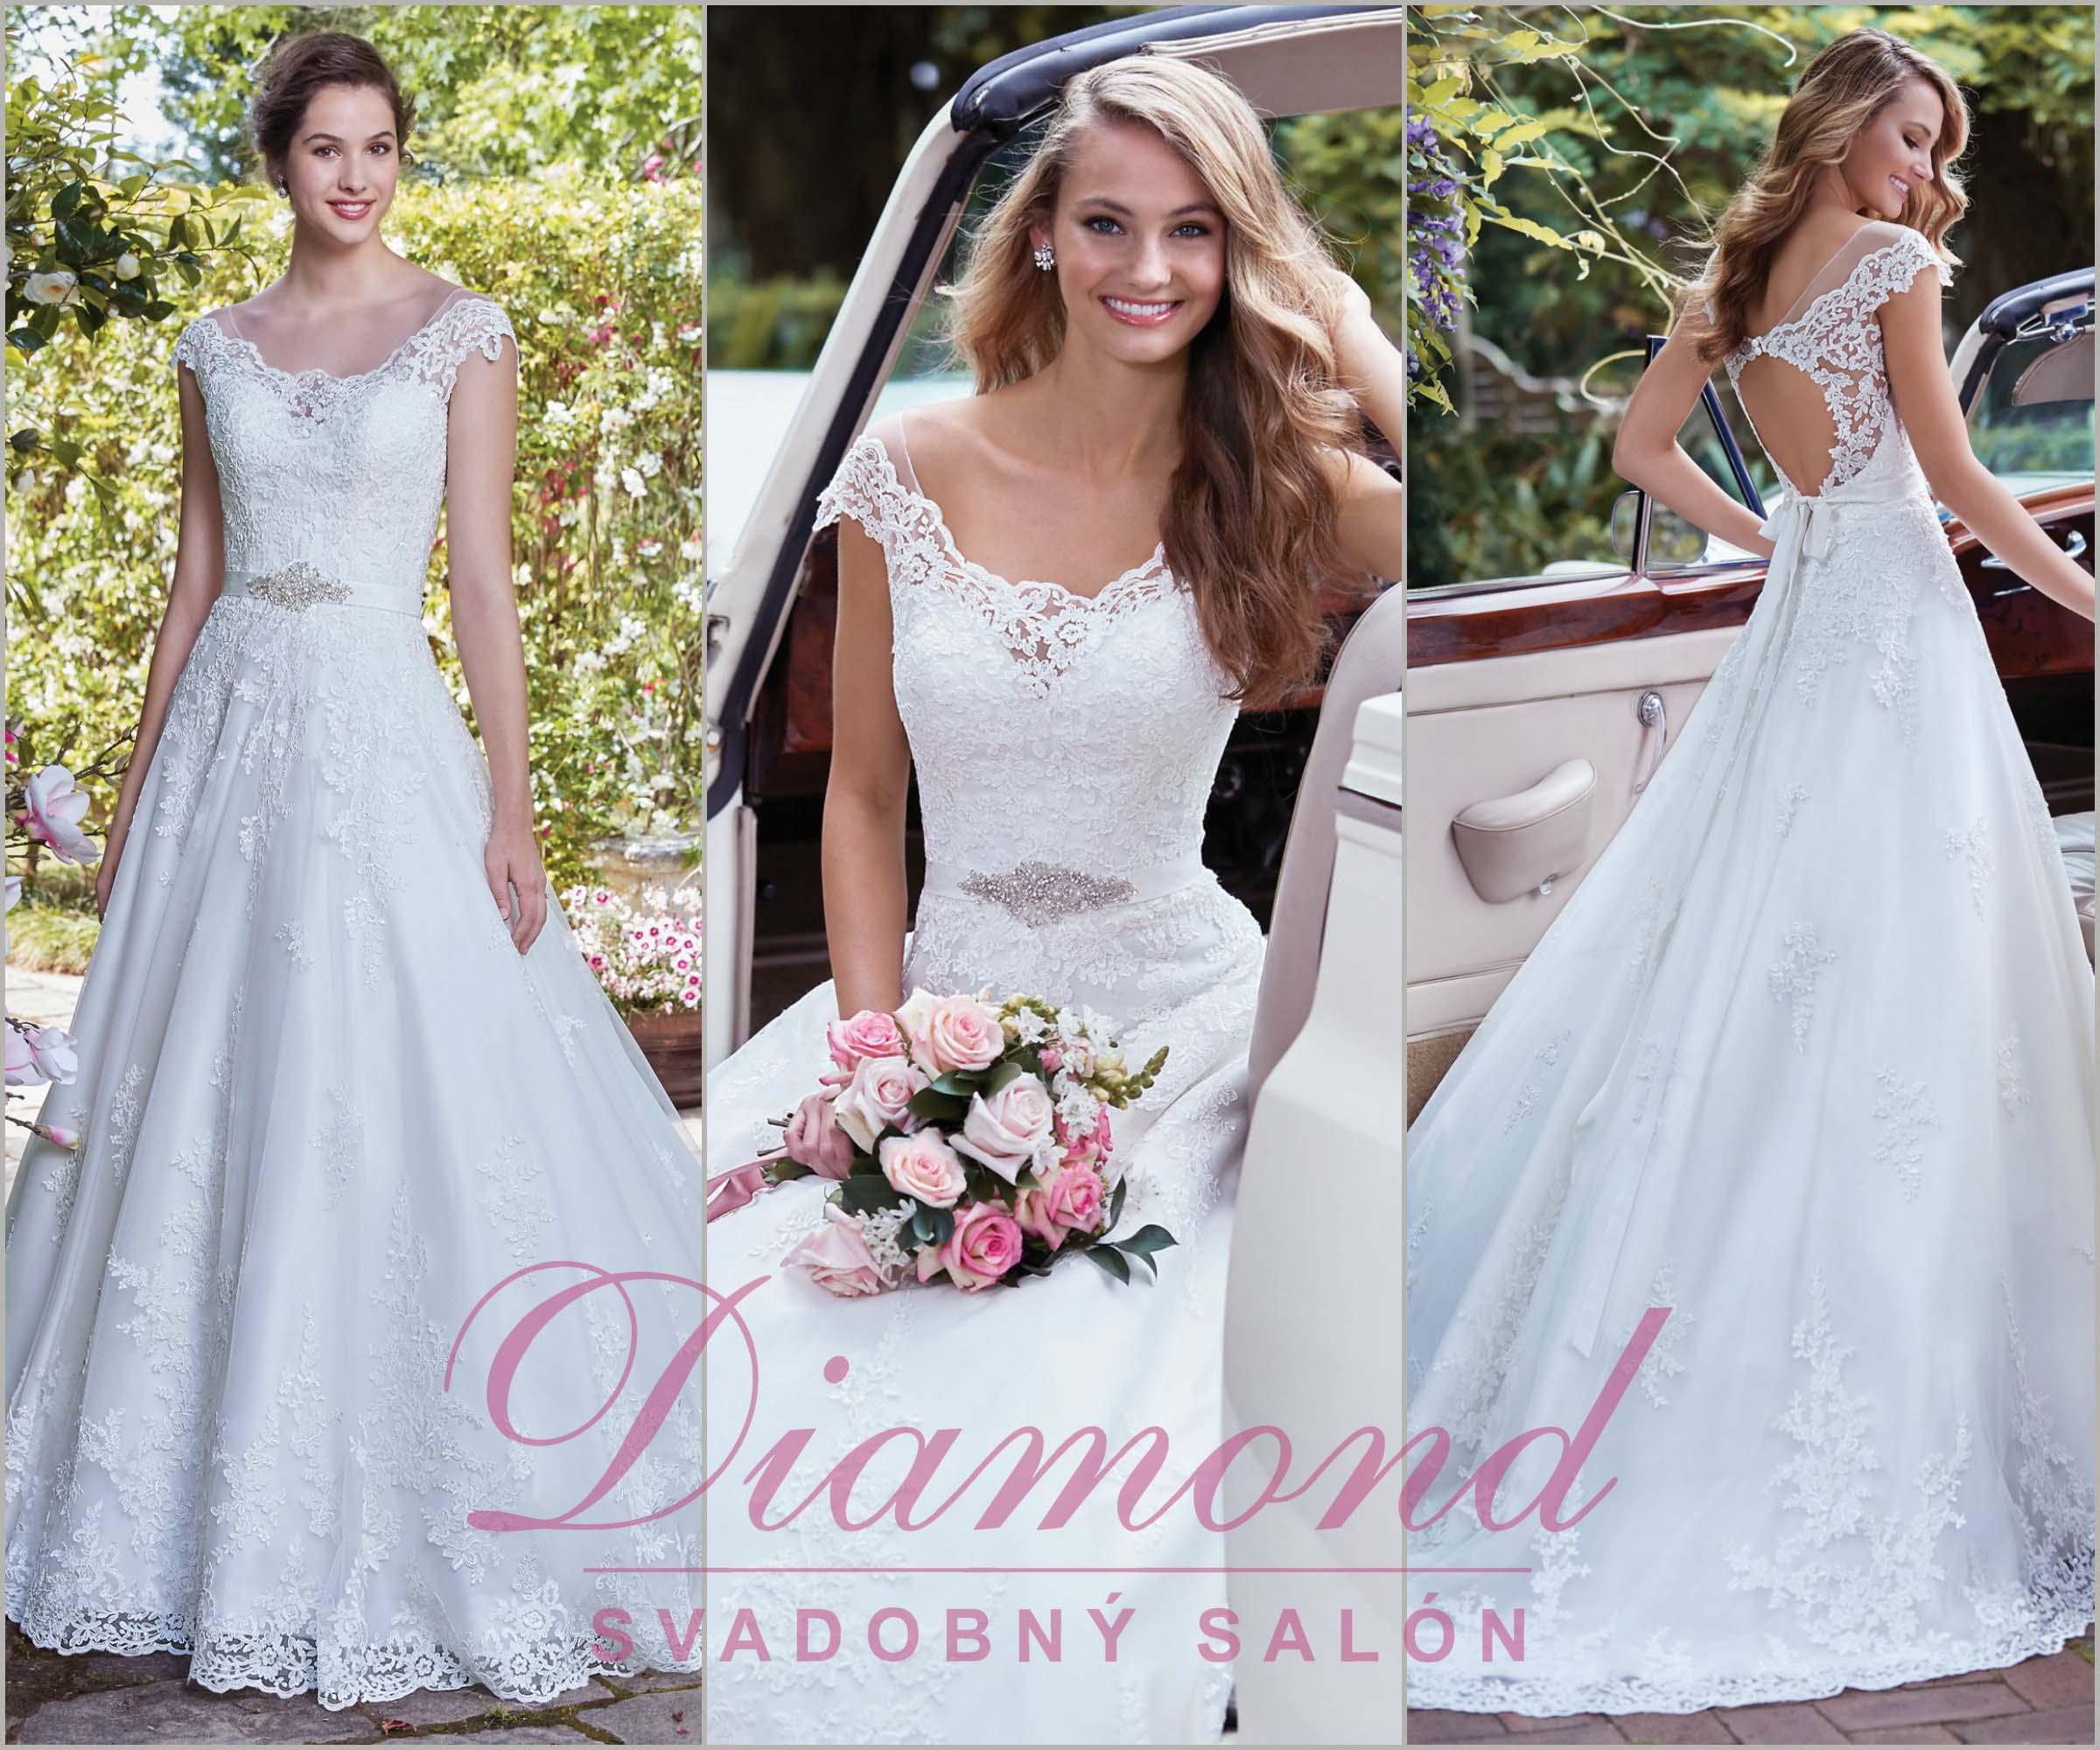 c1dd36f73347 Svadoný salón Diamond - všetko pre svadbu a - Móda